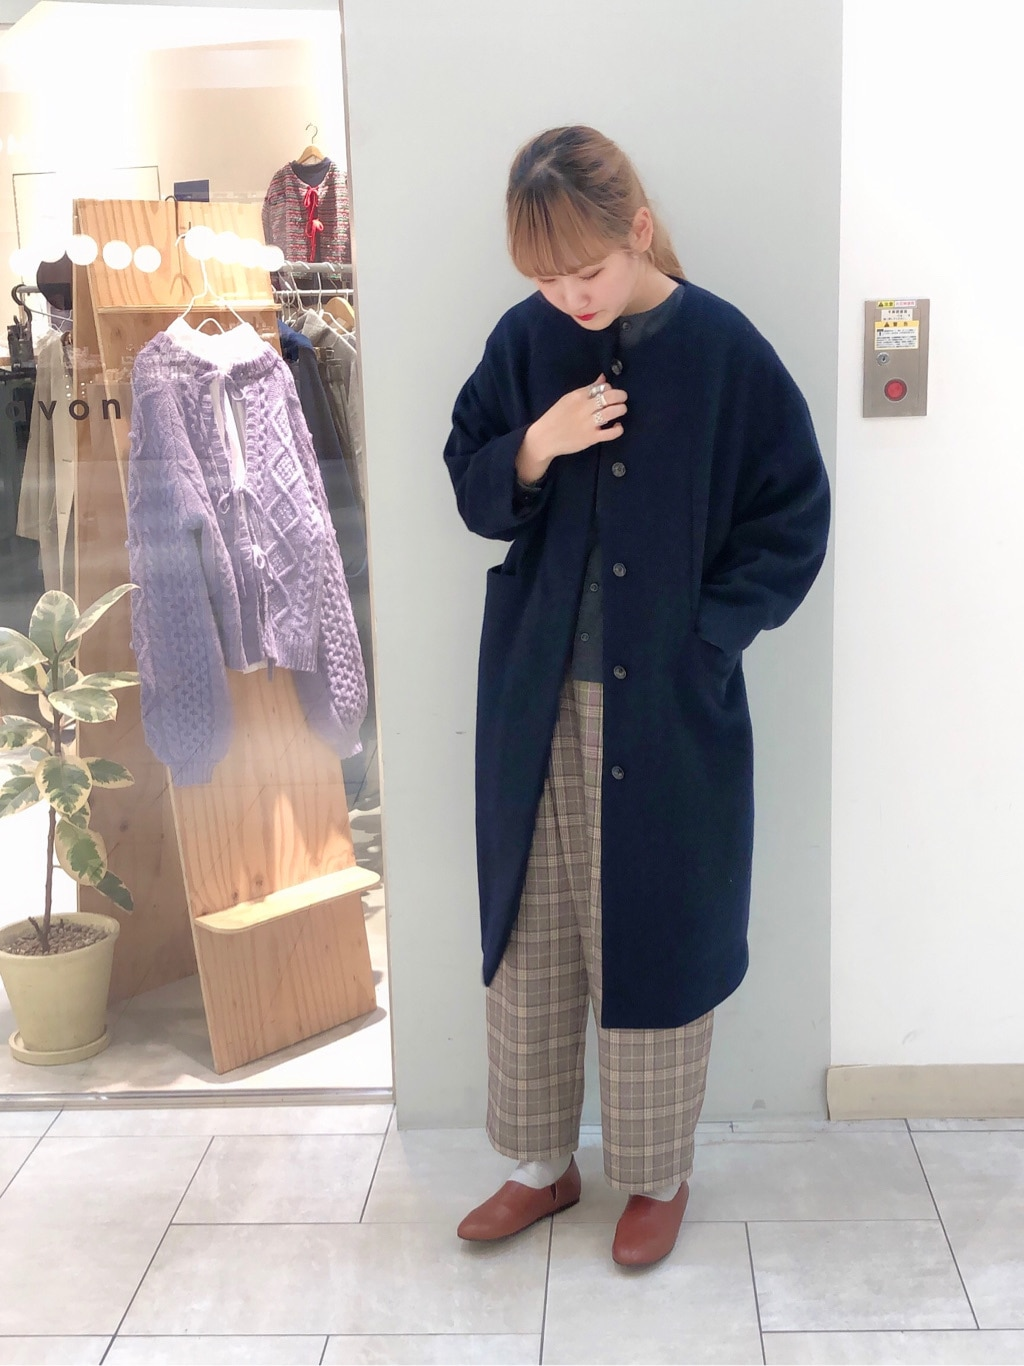 bulle de savon 阪急西宮ガーデンズ 身長:166cm 2019.12.09